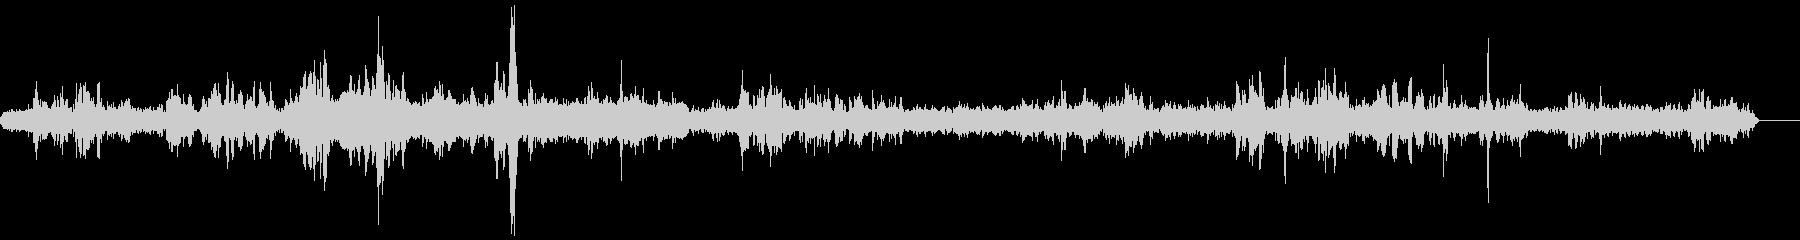 BAR-JUICEBAR-VOIC...の未再生の波形